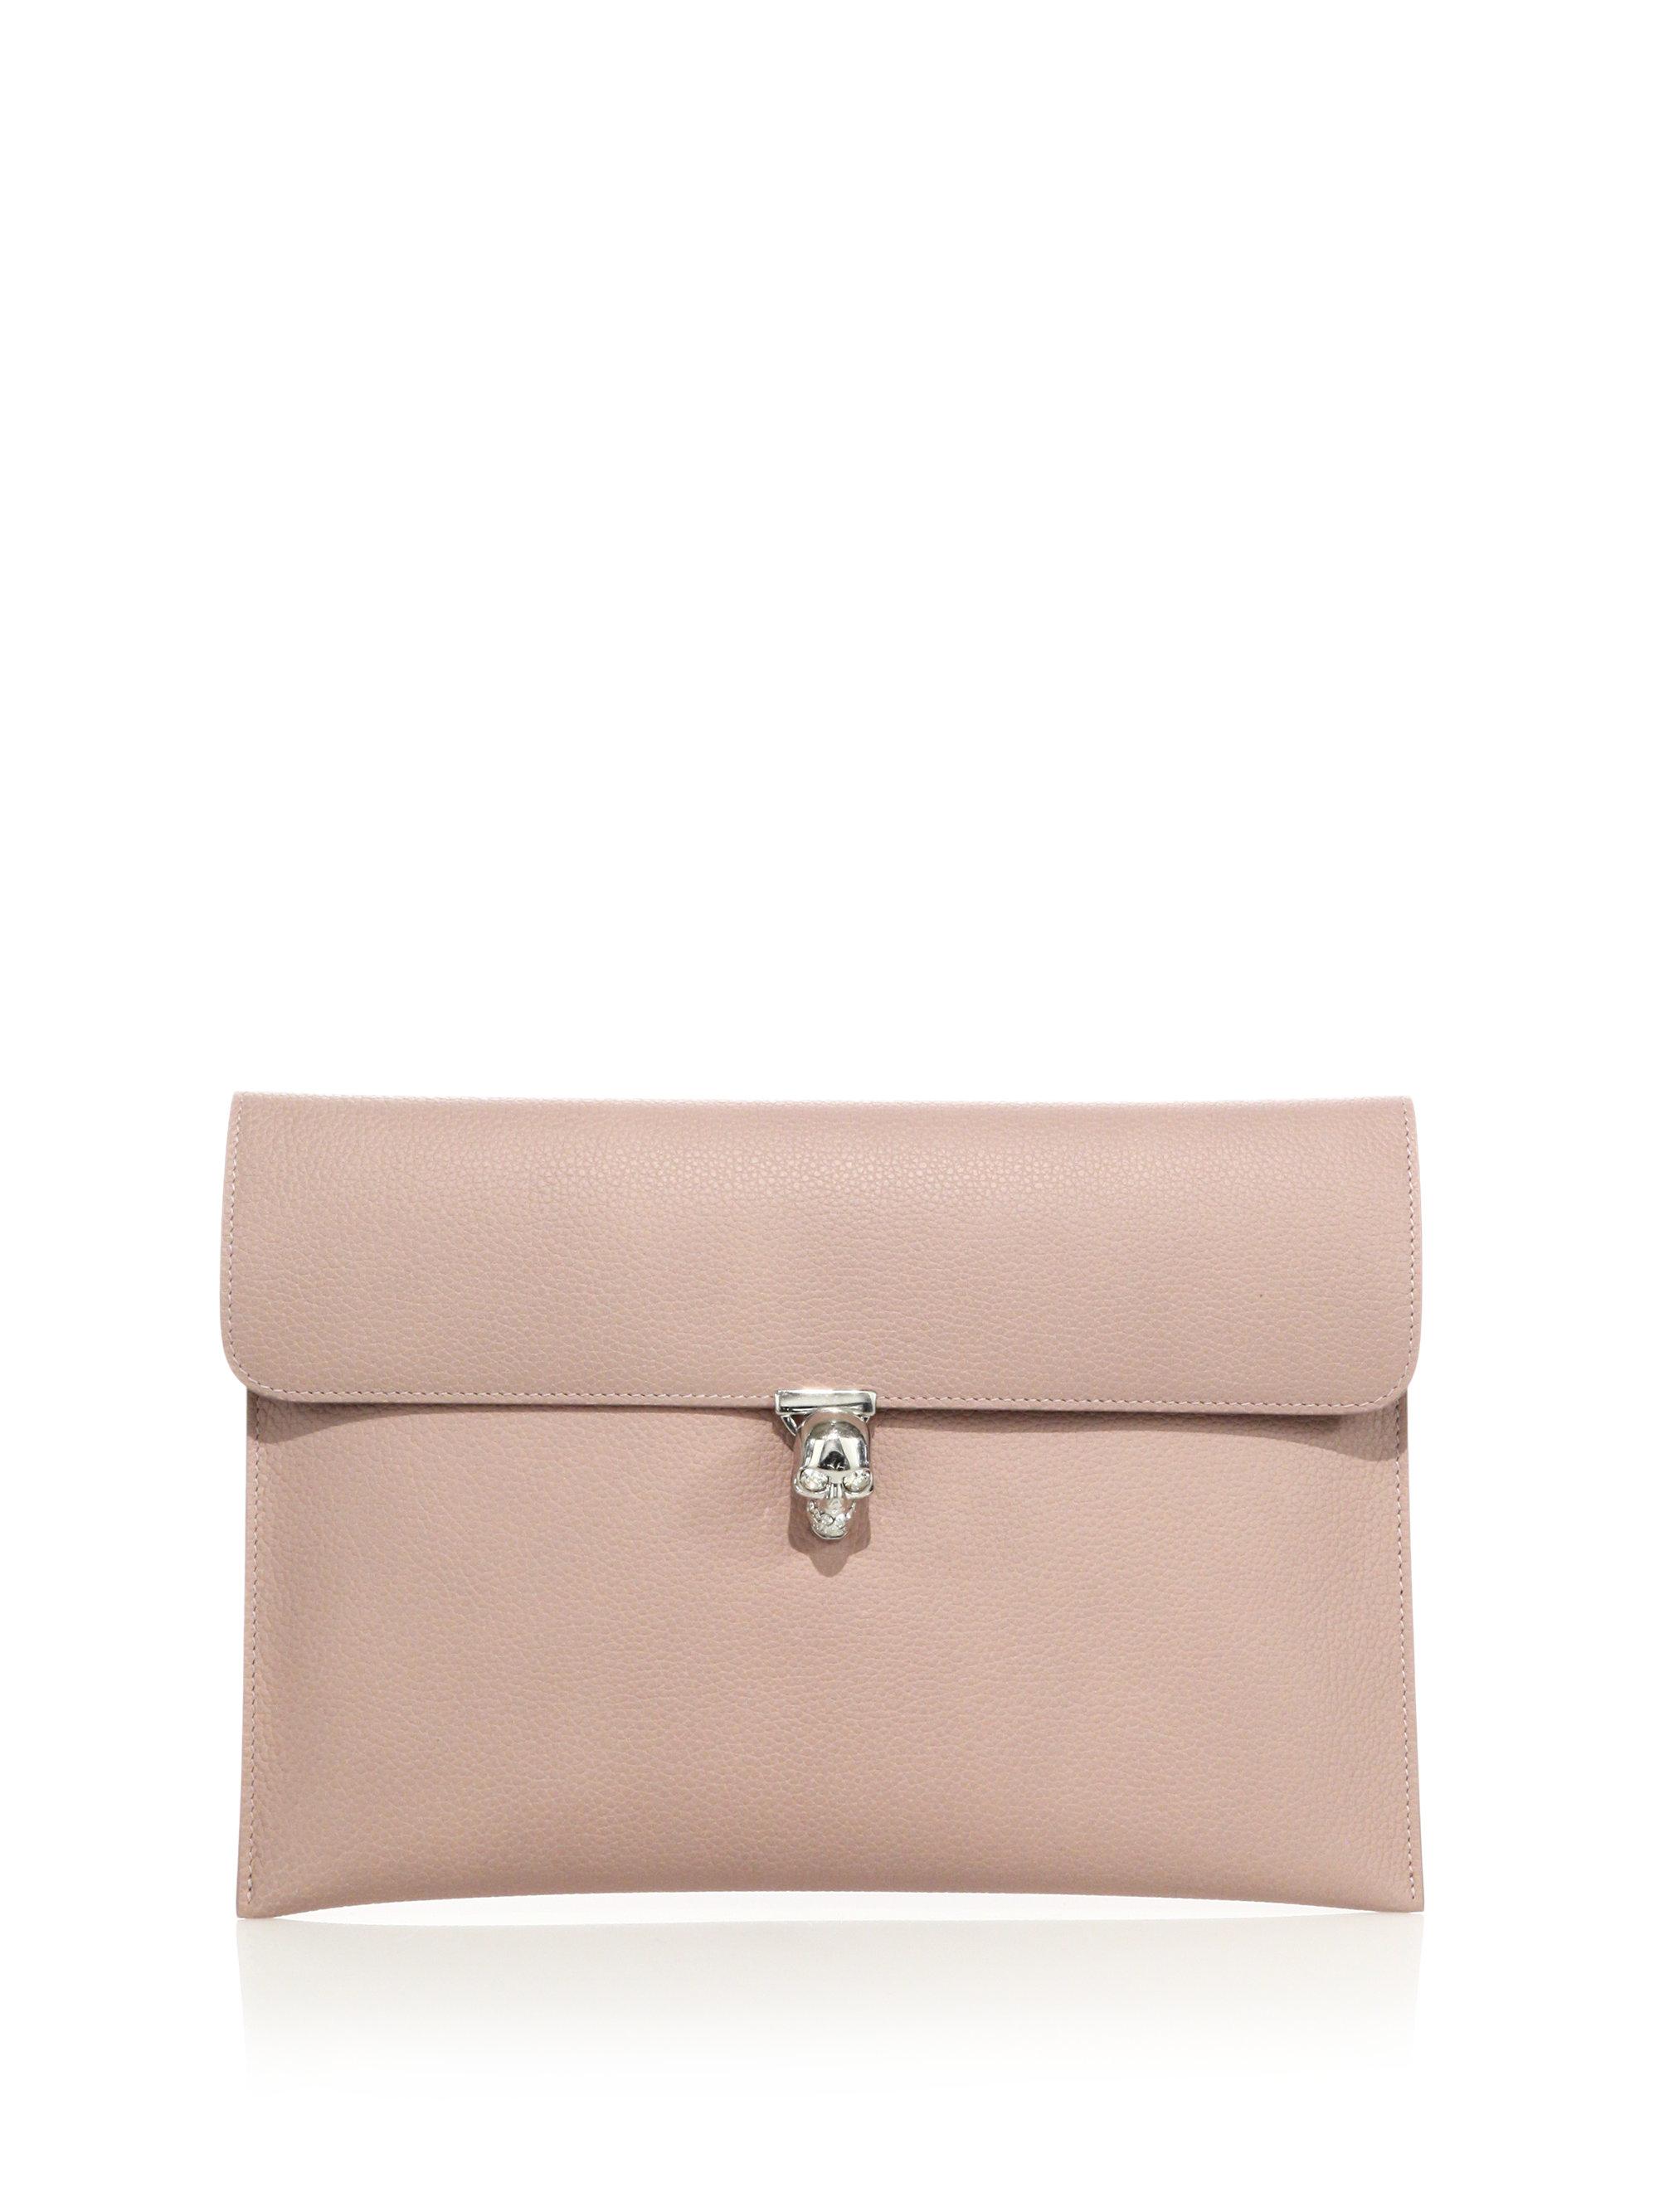 Alexander mcqueen Leather Skull Envelope Clutch in Pink | Lyst